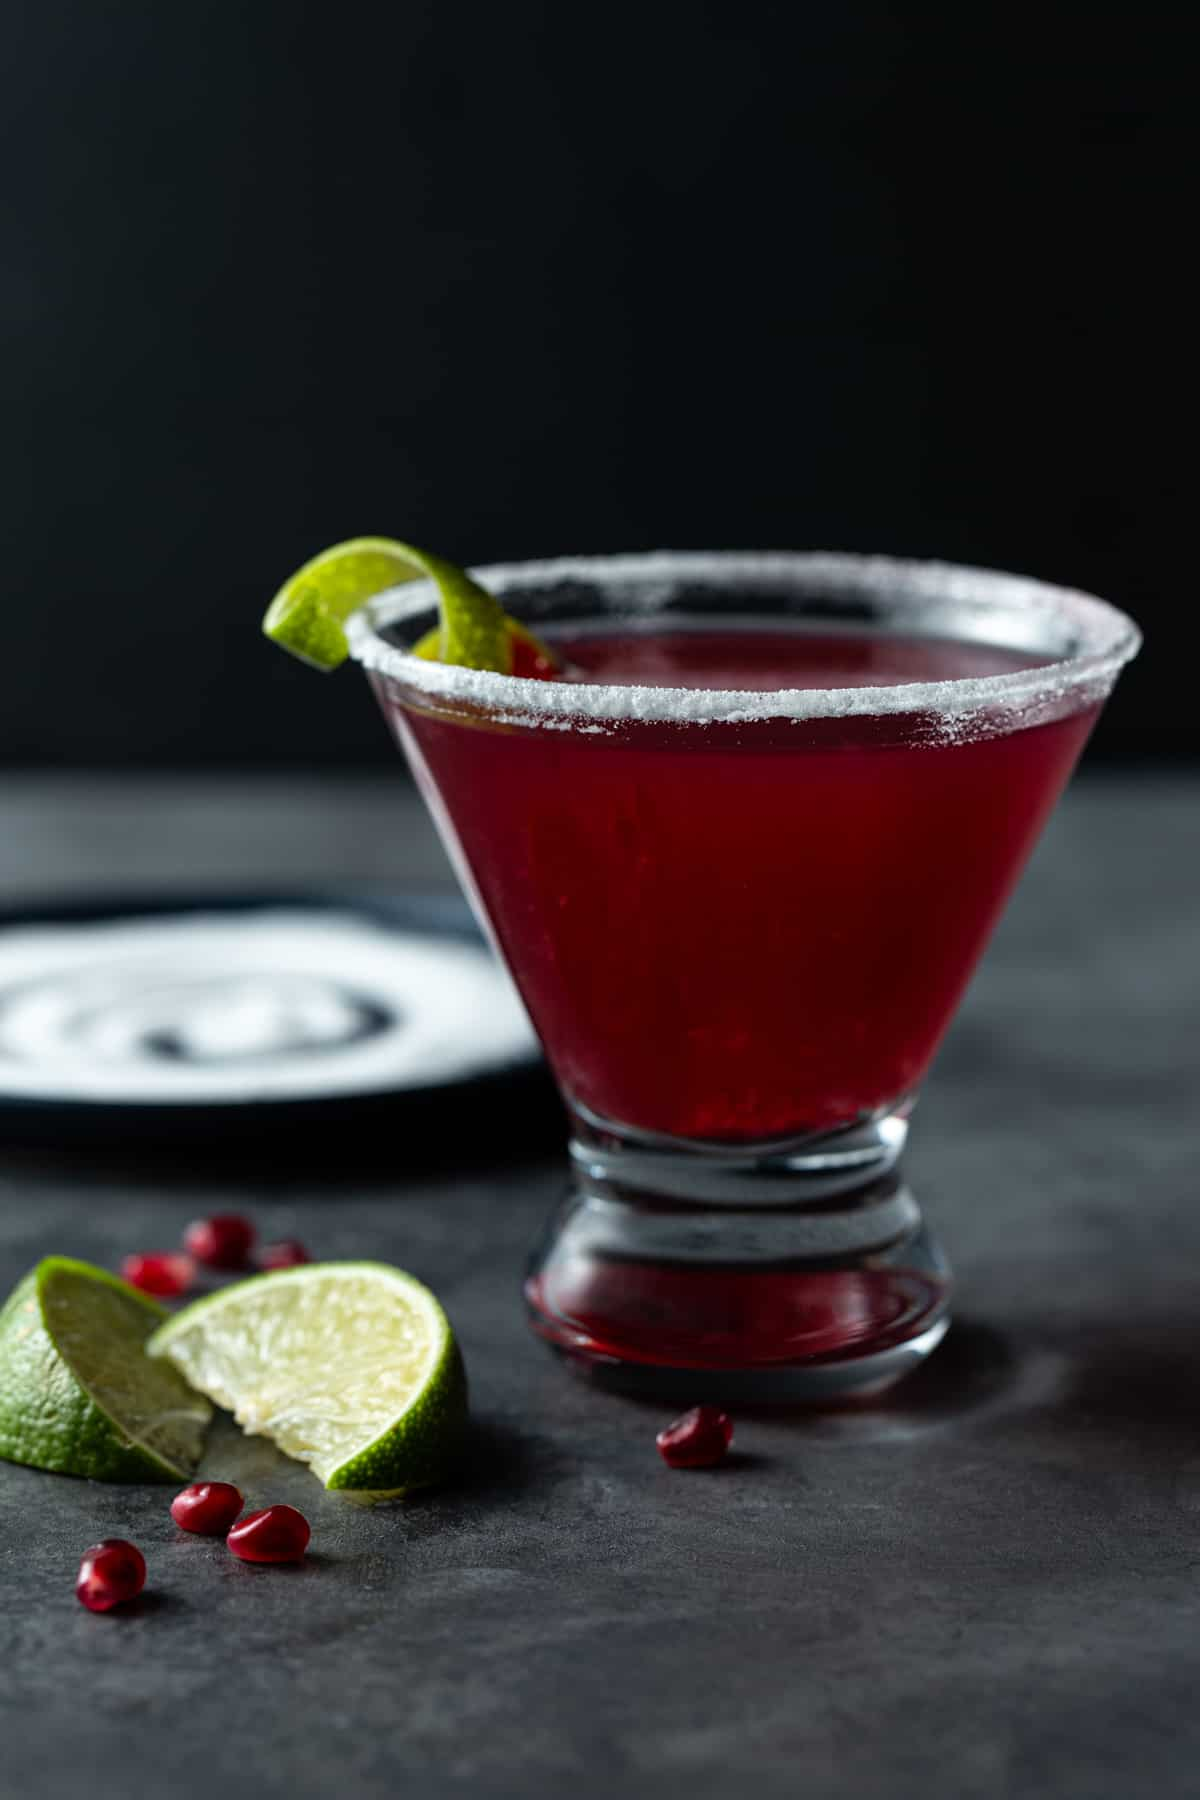 A martini in a rimmed glass.